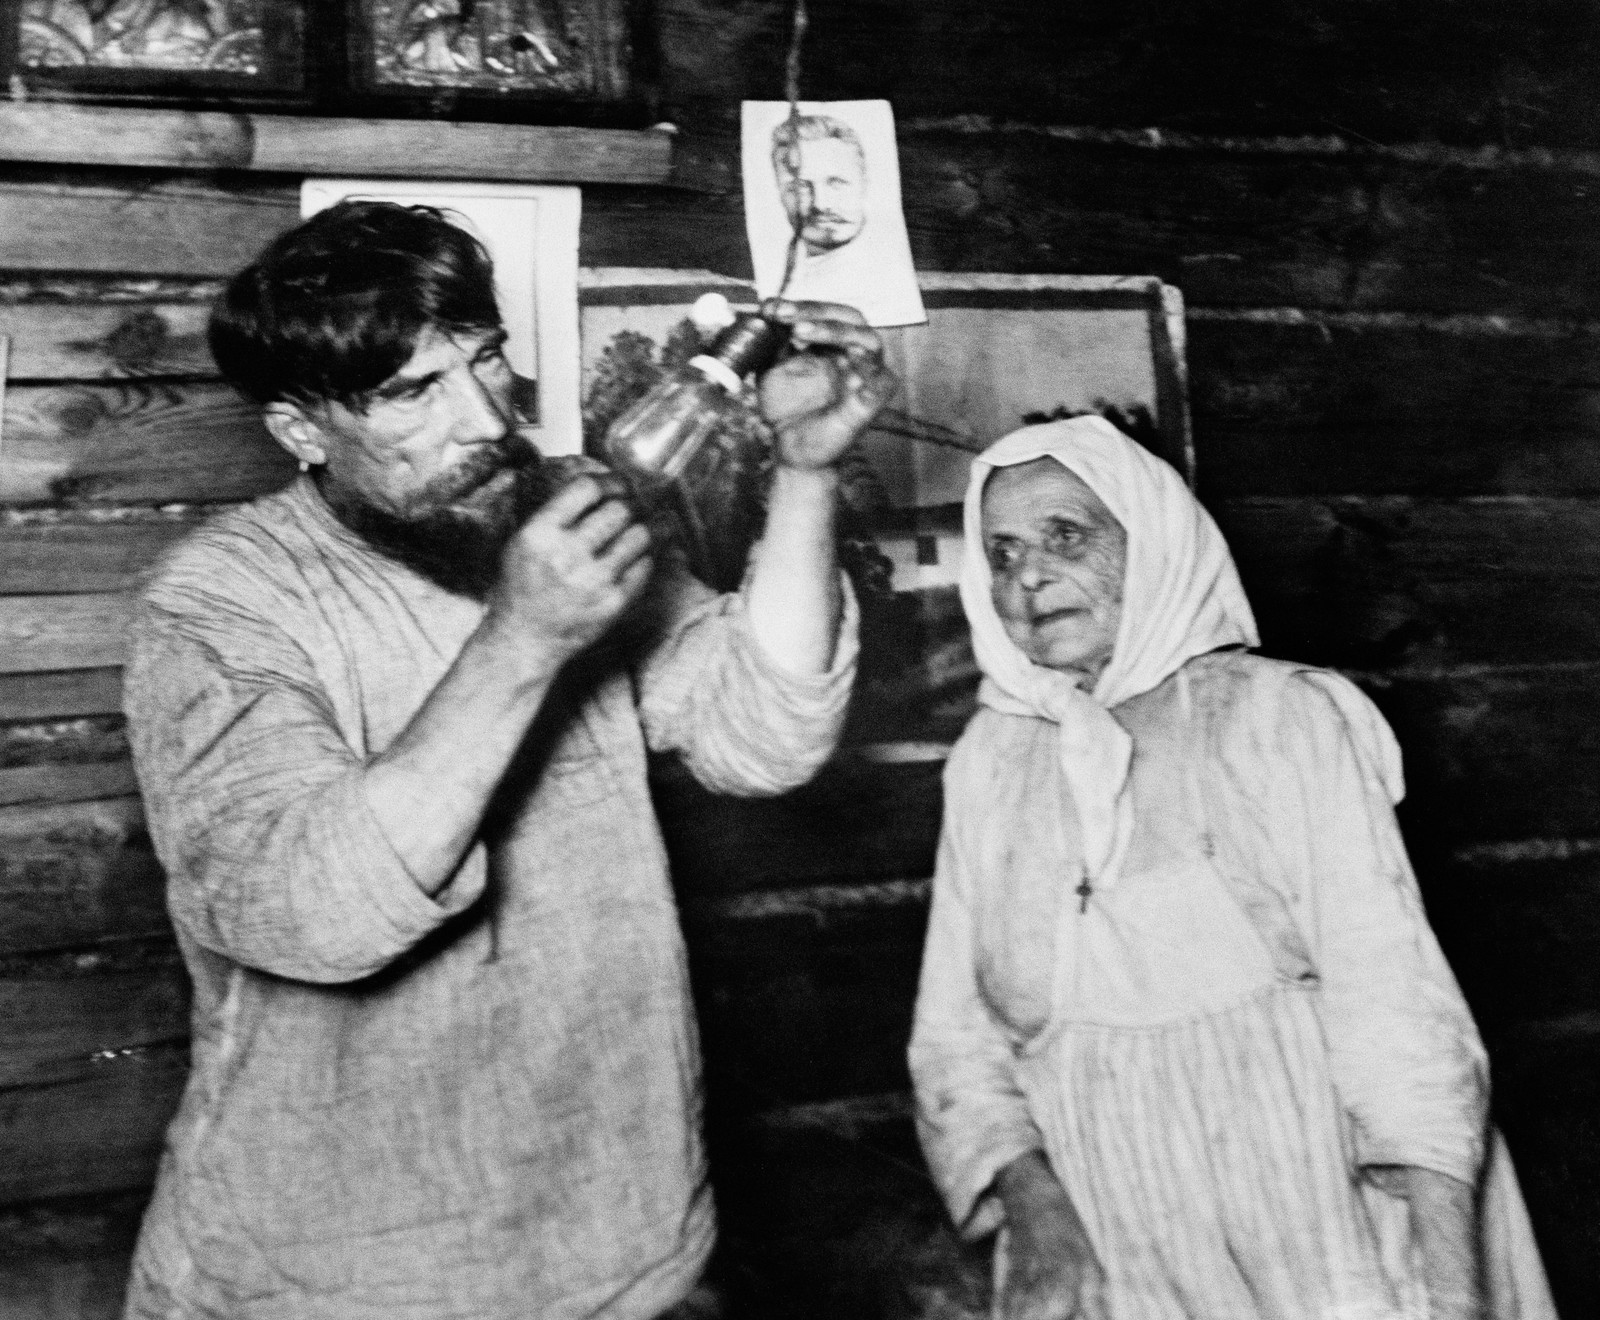 1925. Лампочка Ильича. Шатура дала ток, декабрь